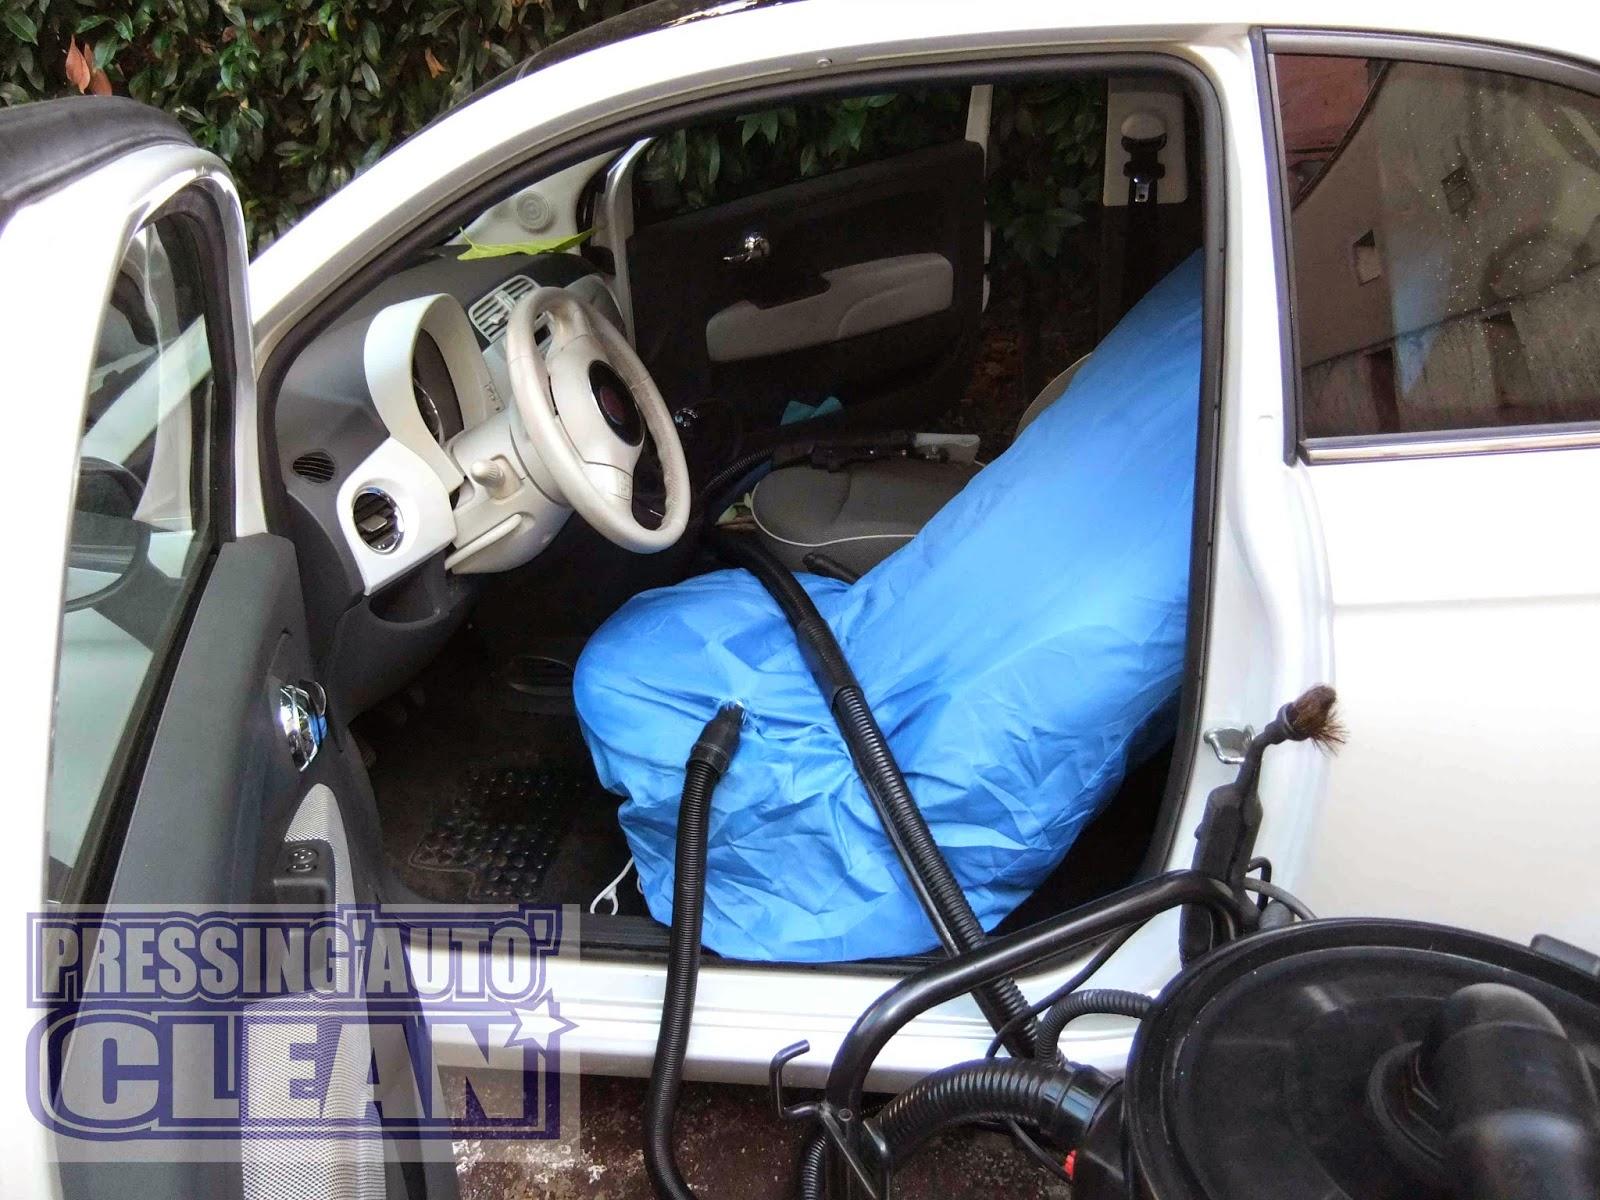 service de pressing auto la carte marignane. Black Bedroom Furniture Sets. Home Design Ideas